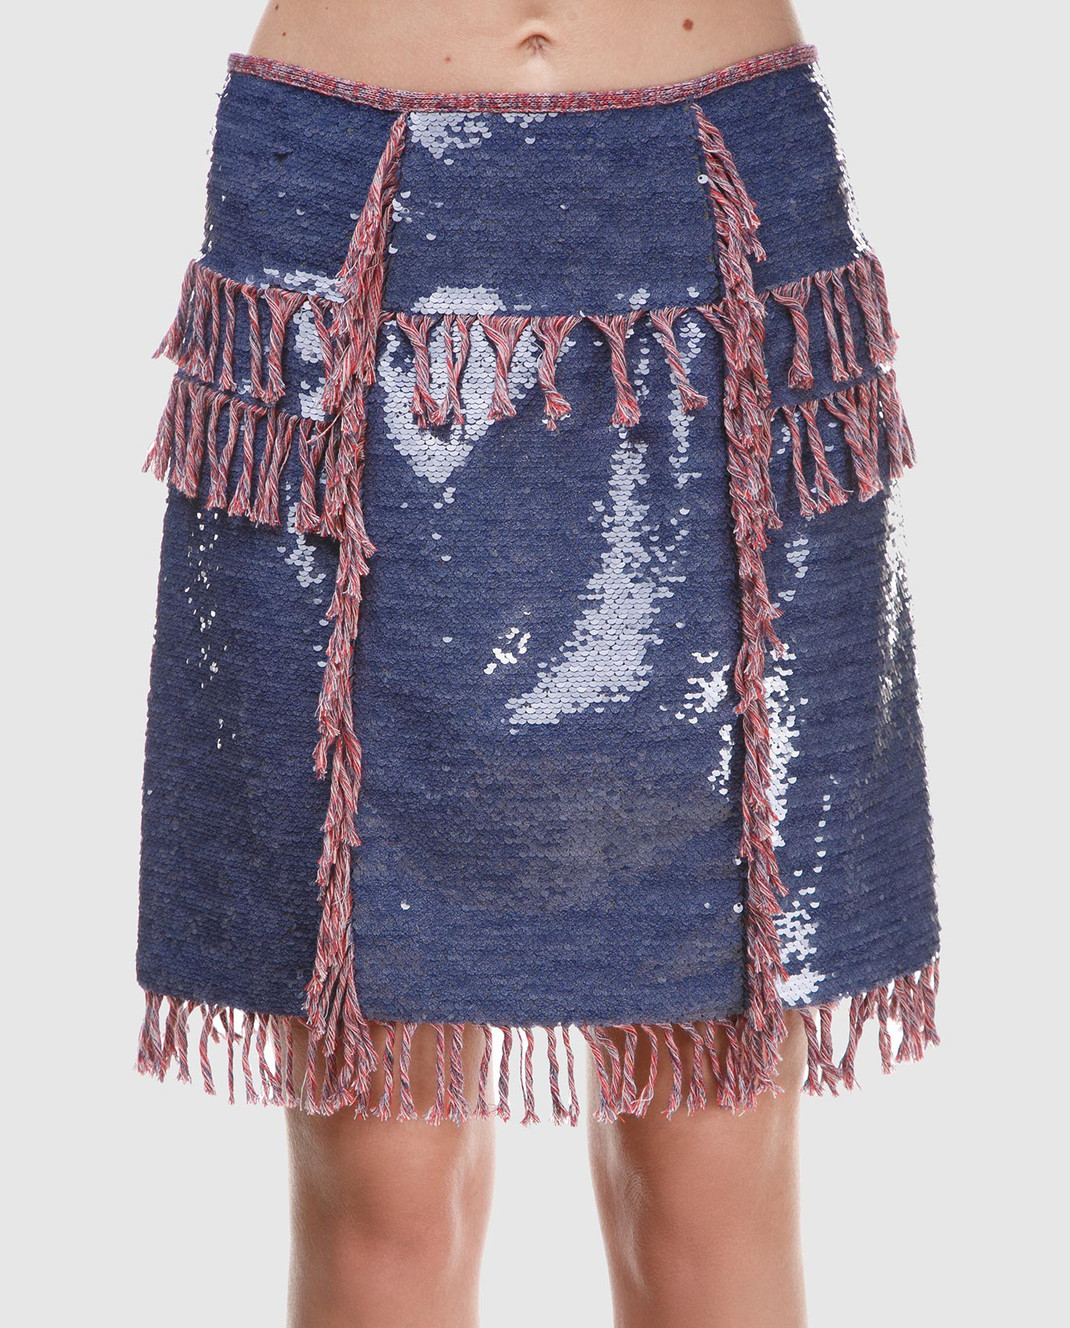 Balmain Синяя юбка с пайетками 124500 изображение 3